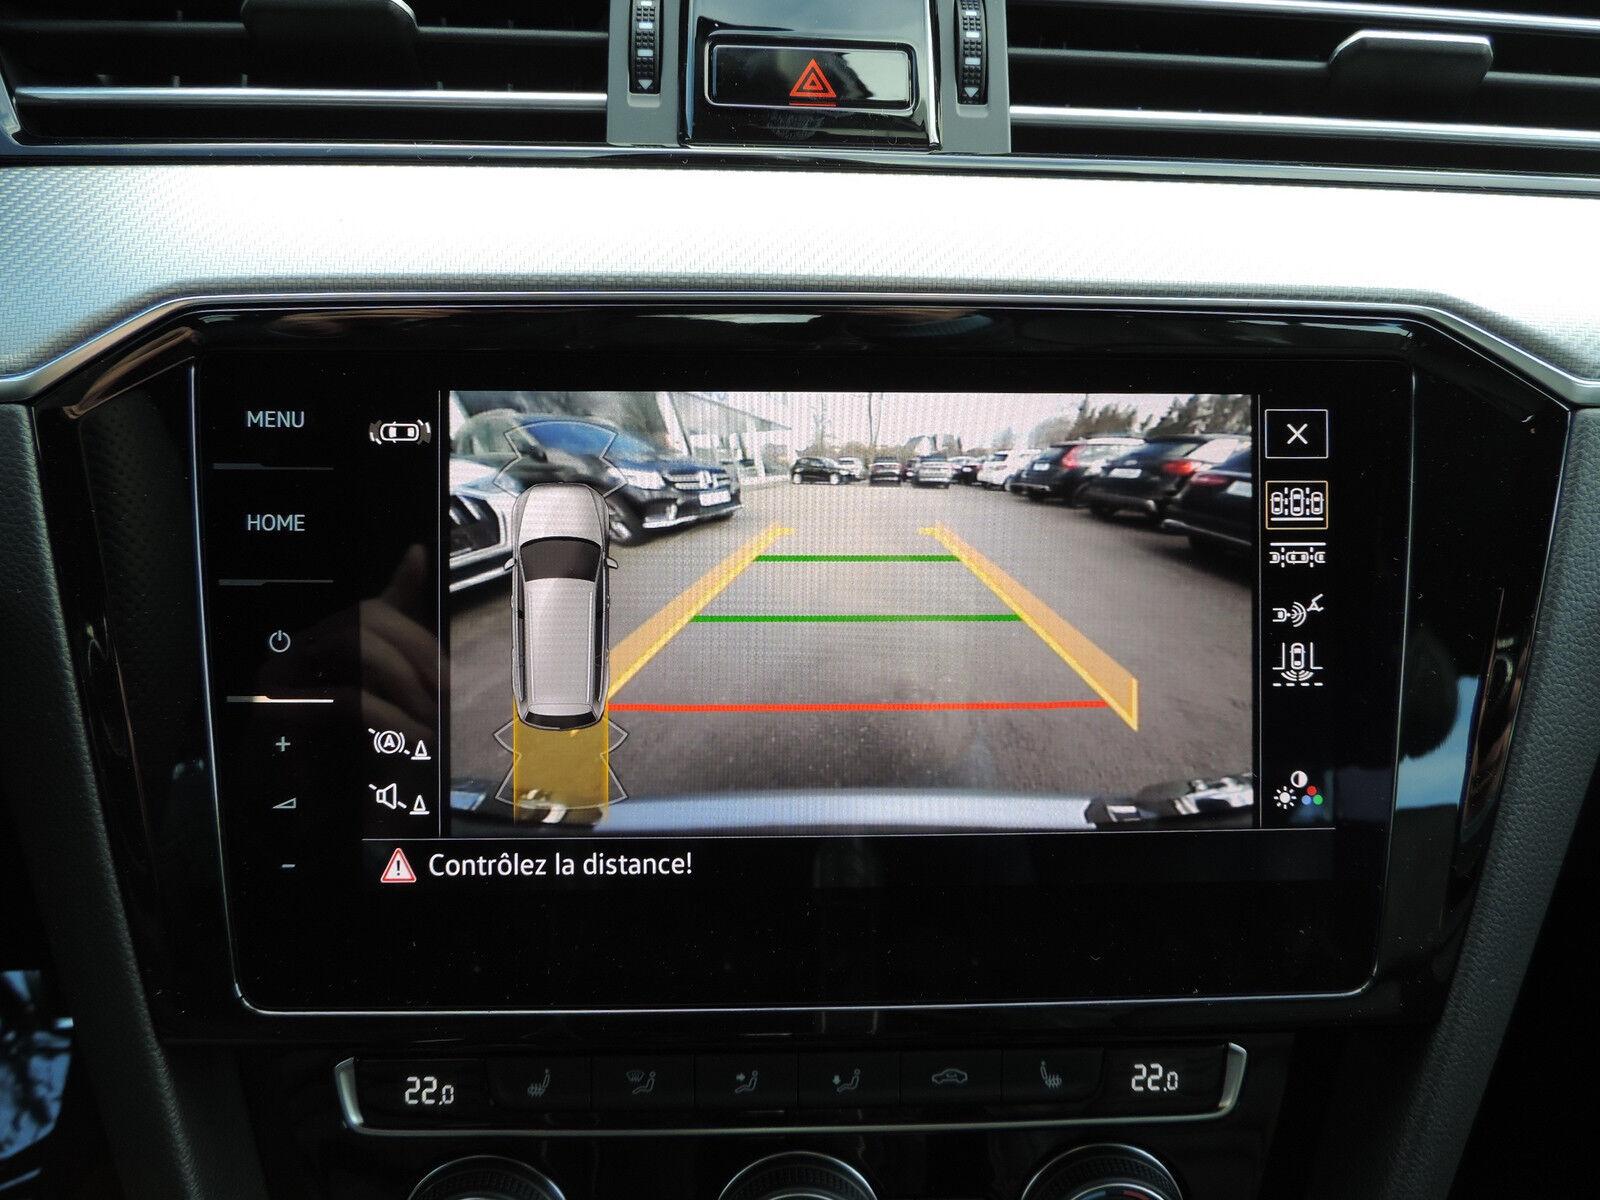 Volkswagen Passat Variant 2.0 TSI R-Line DSG CUIR GPS ACC LANE NEUVE 11/15